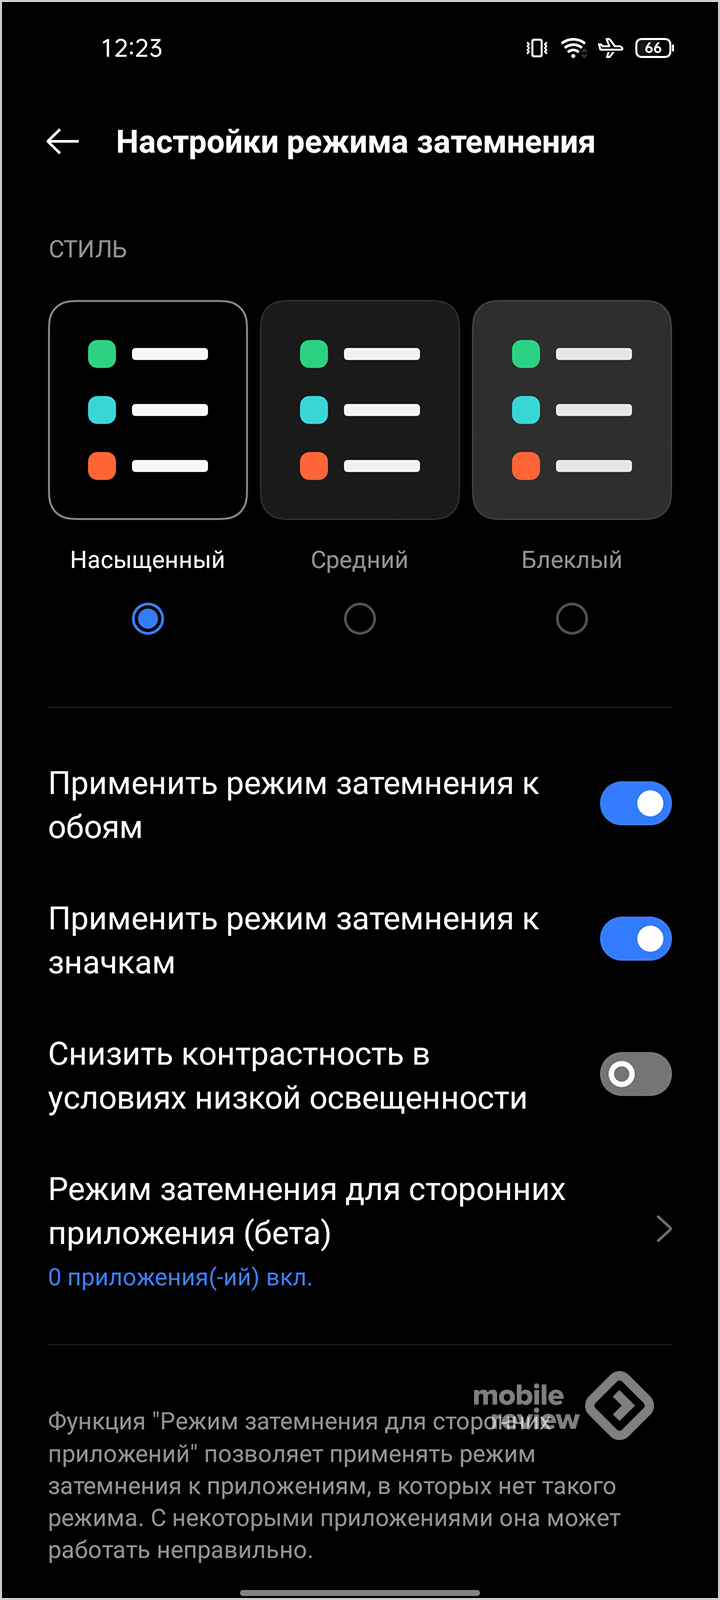 Обзор оболочки realmeUI2.0